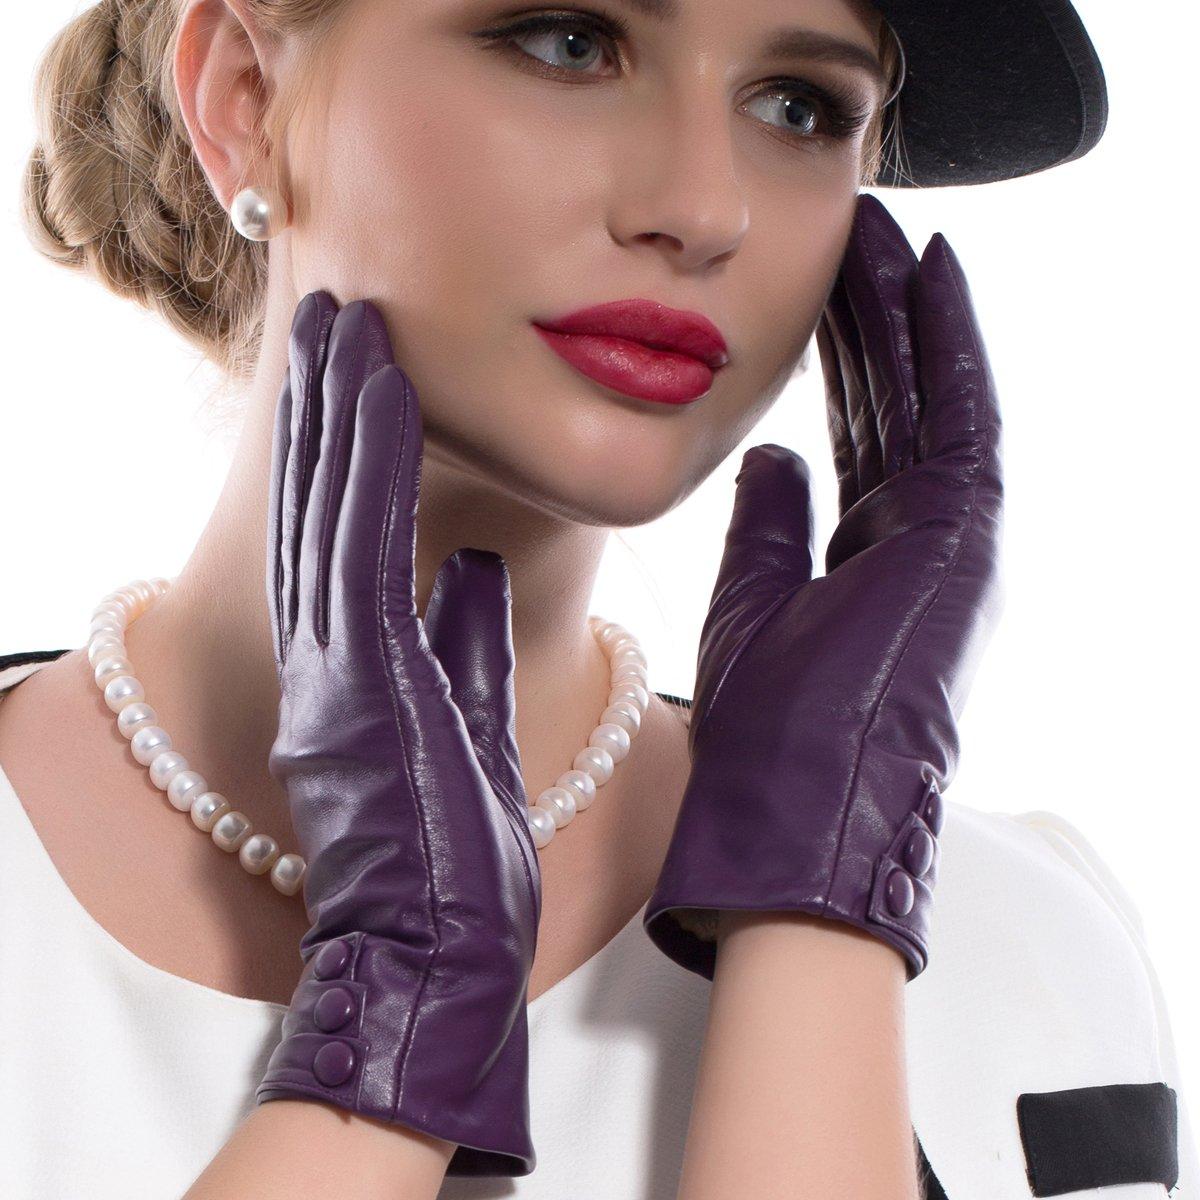 MATSU Fashion Women Winter Warm Leather Touch Screen Gloves 5 Colors M9213- (XL, Purple (Long Fleece or Cashmere lining))